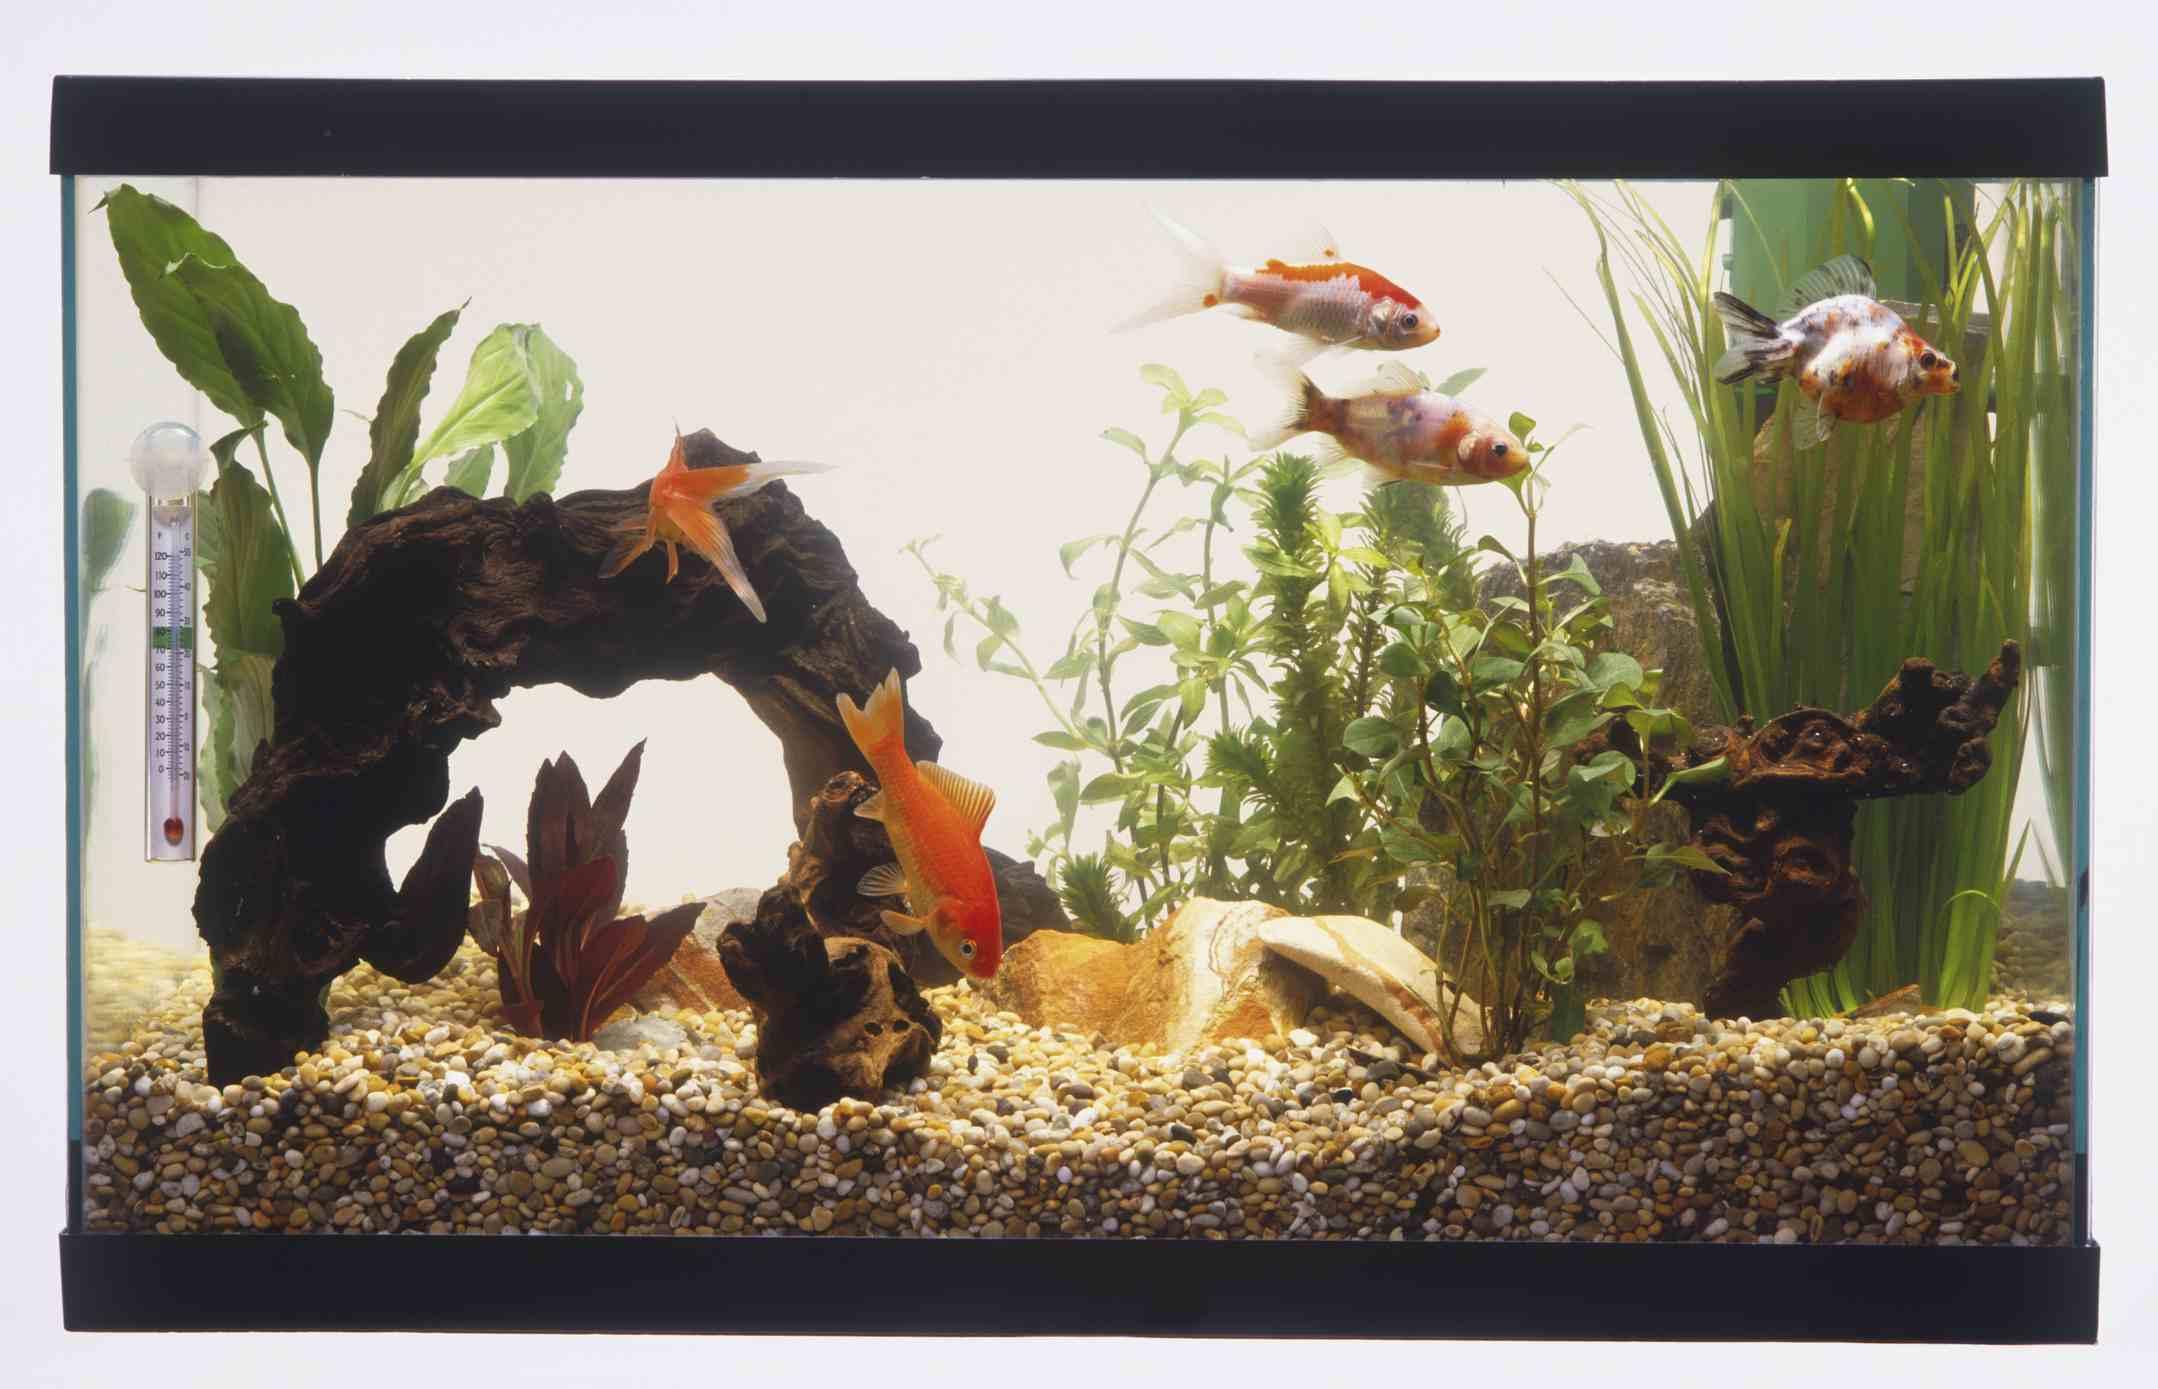 Choosing a Saltwater Aquarium Filtration System